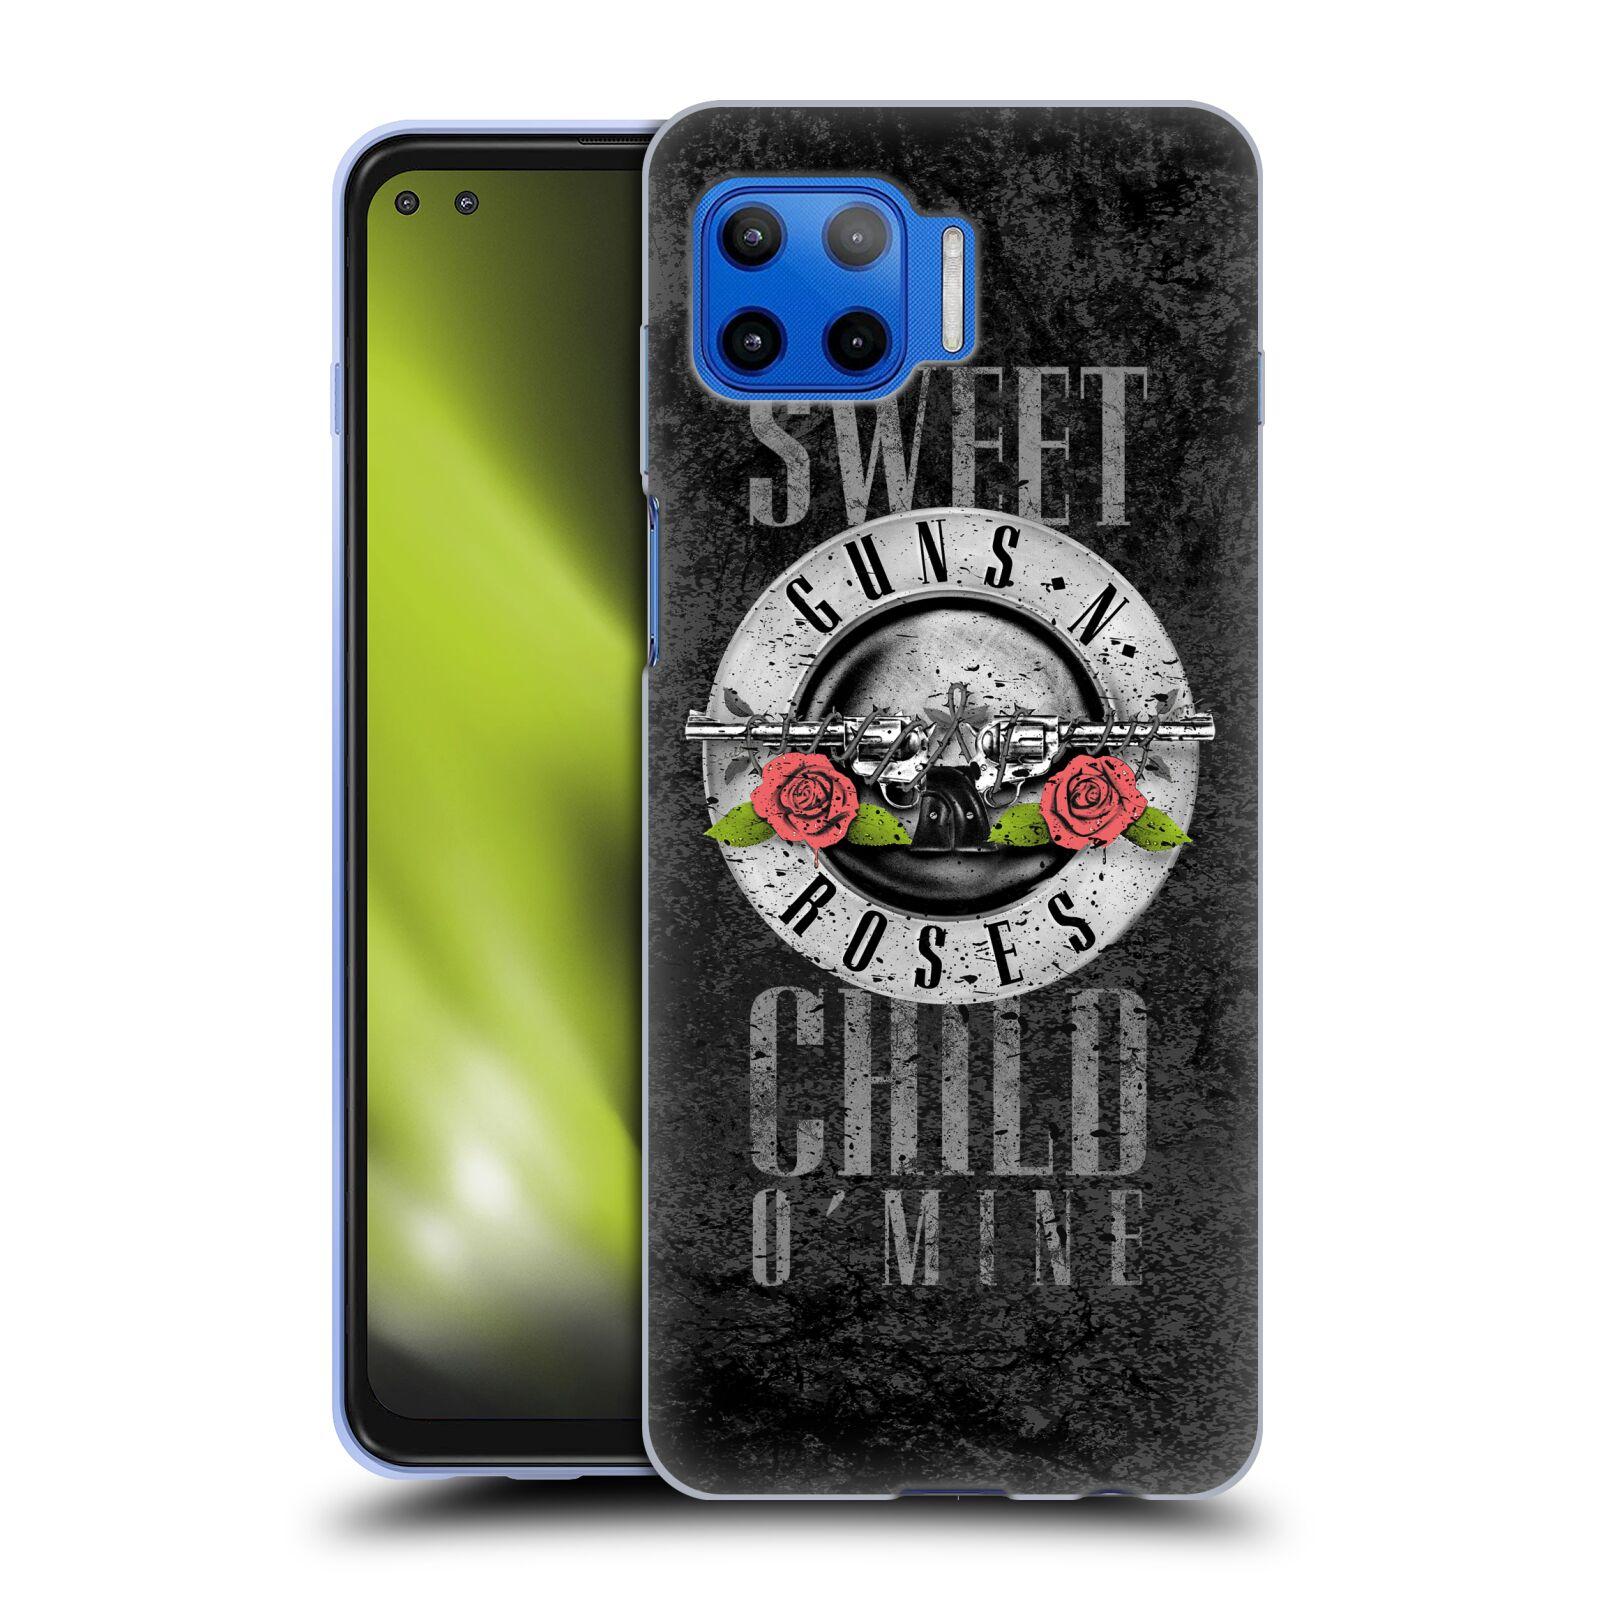 Silikonové pouzdro na mobil Motorola Moto G 5G Plus - Head Case - Guns N' Roses - Sweet Child